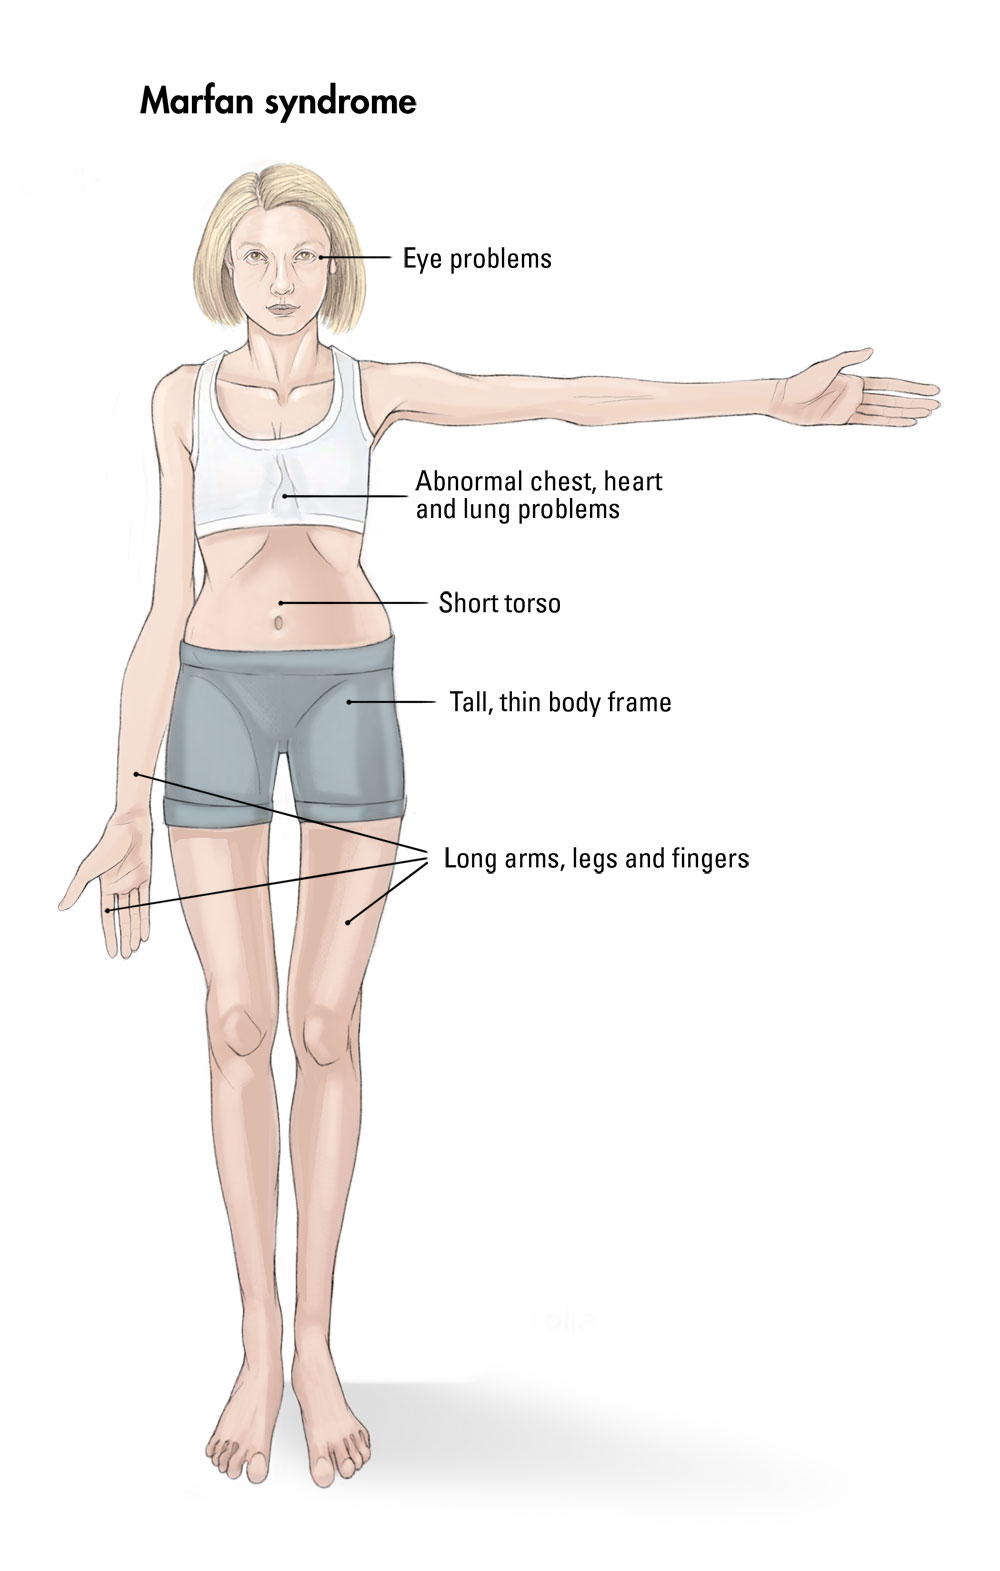 Human Biology Online Lab / Marfan syndrome